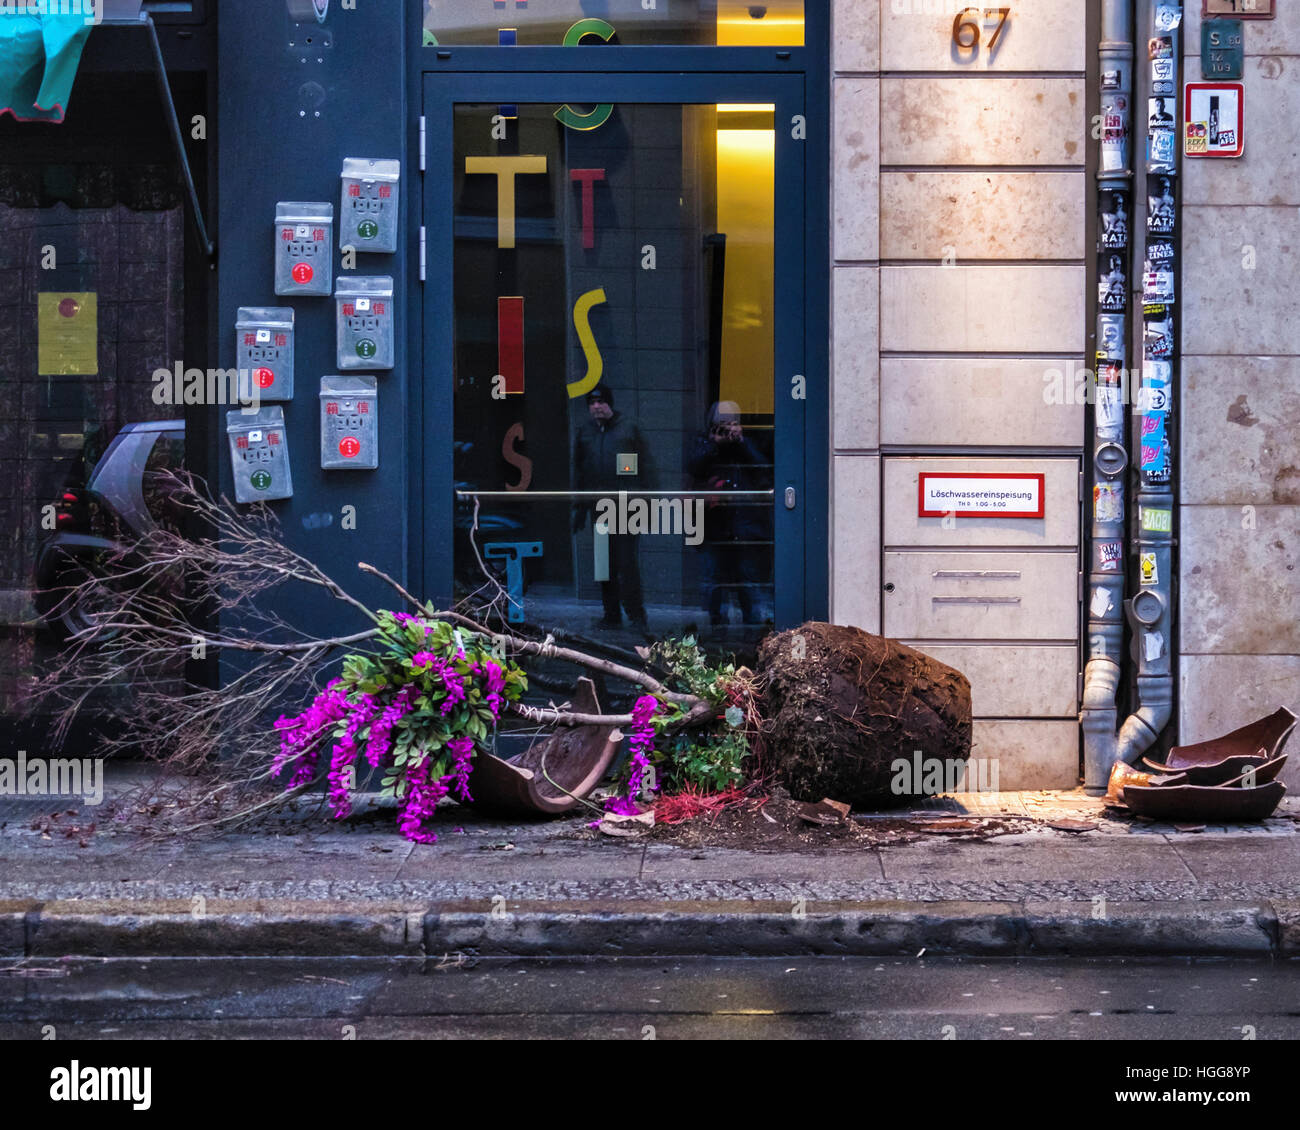 Berlin, Mitte. Vandalism. Vandalised, broken plant pot on city street pavement - Stock Image